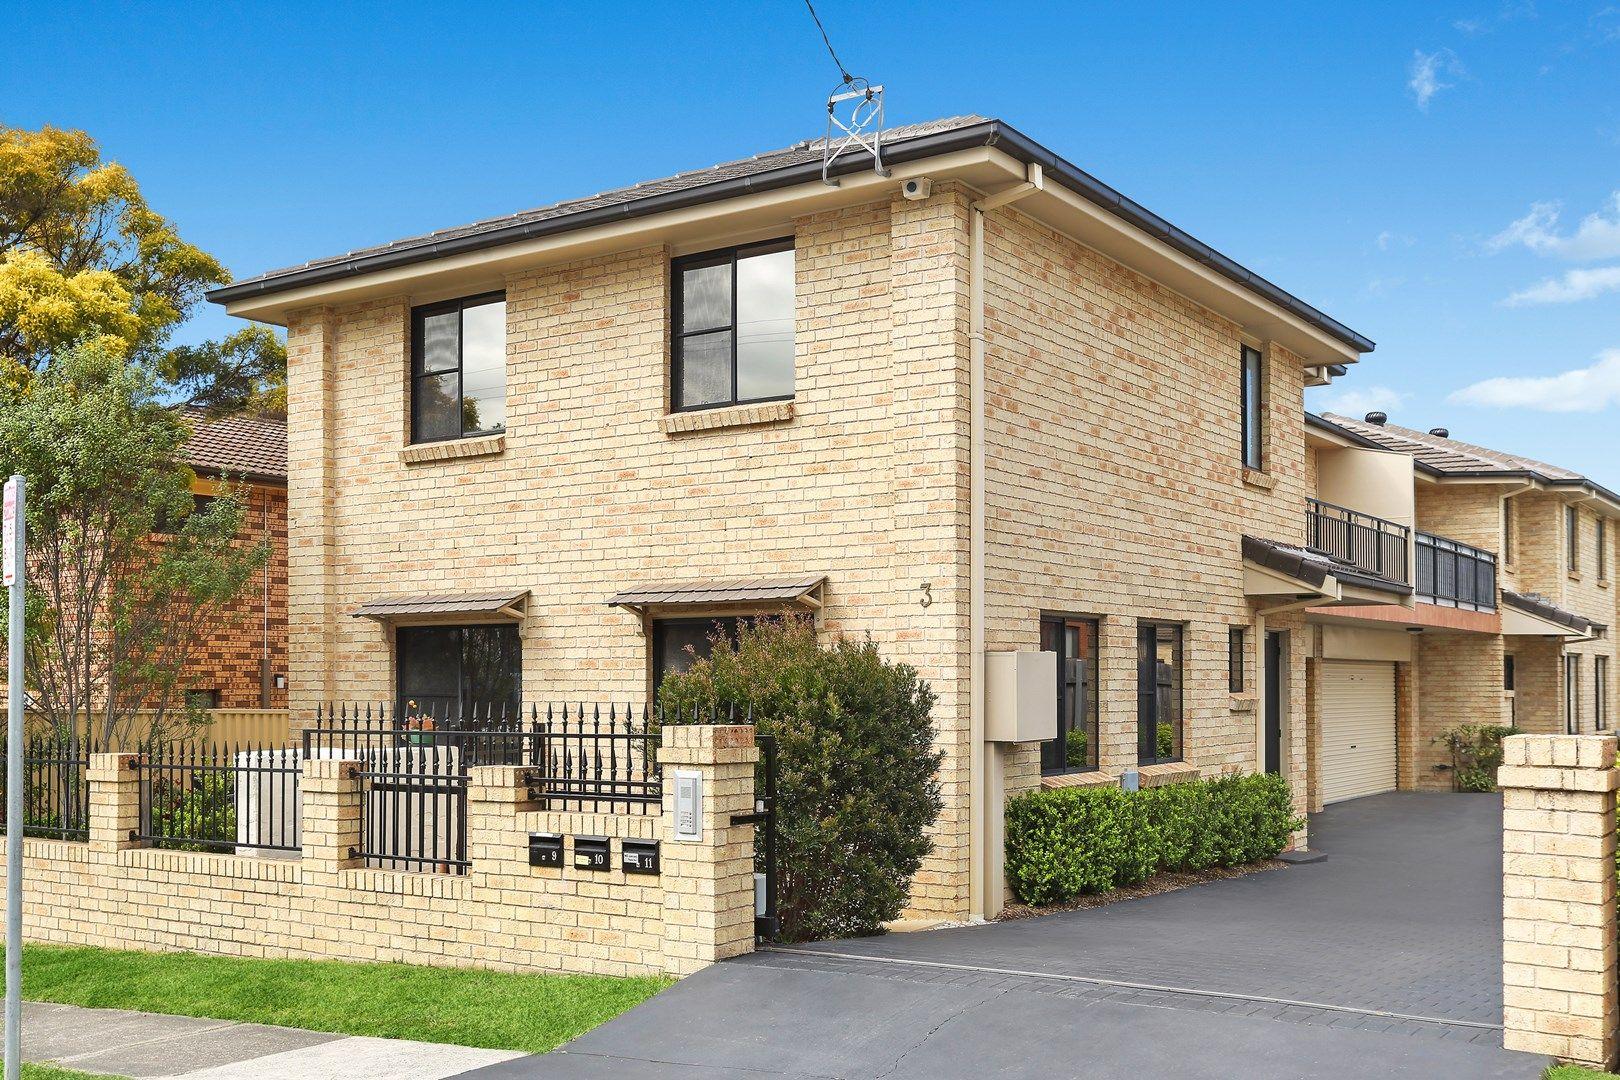 11/3 New Dapto Road, Wollongong NSW 2500, Image 0